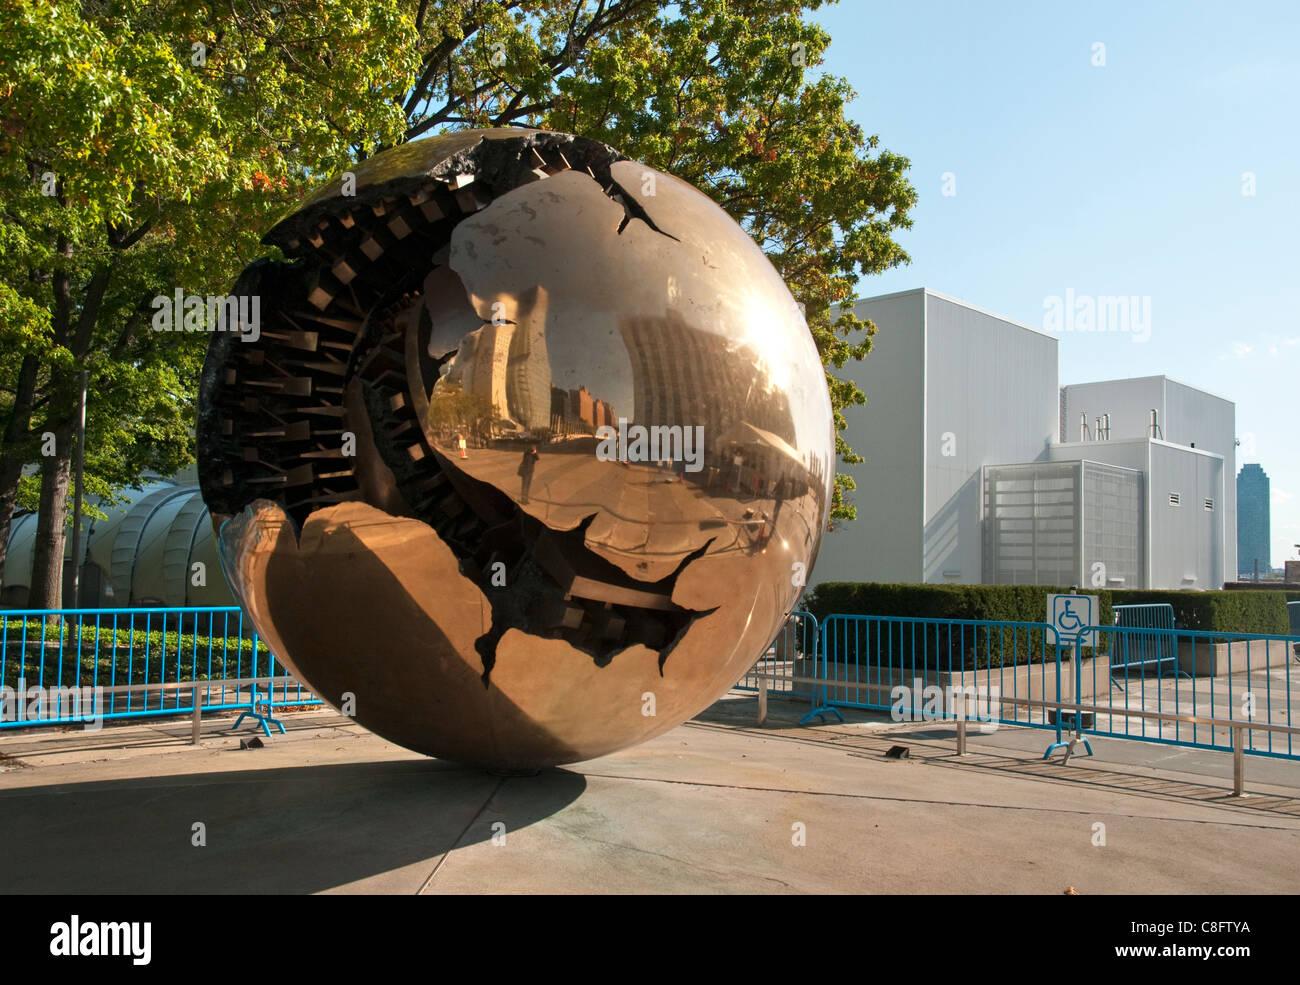 "Arnaldo Pomodoros ""Sphäre in einer Kugel"" bei den Vereinten Nationen am Hauptsitz in New York City. Stockbild"